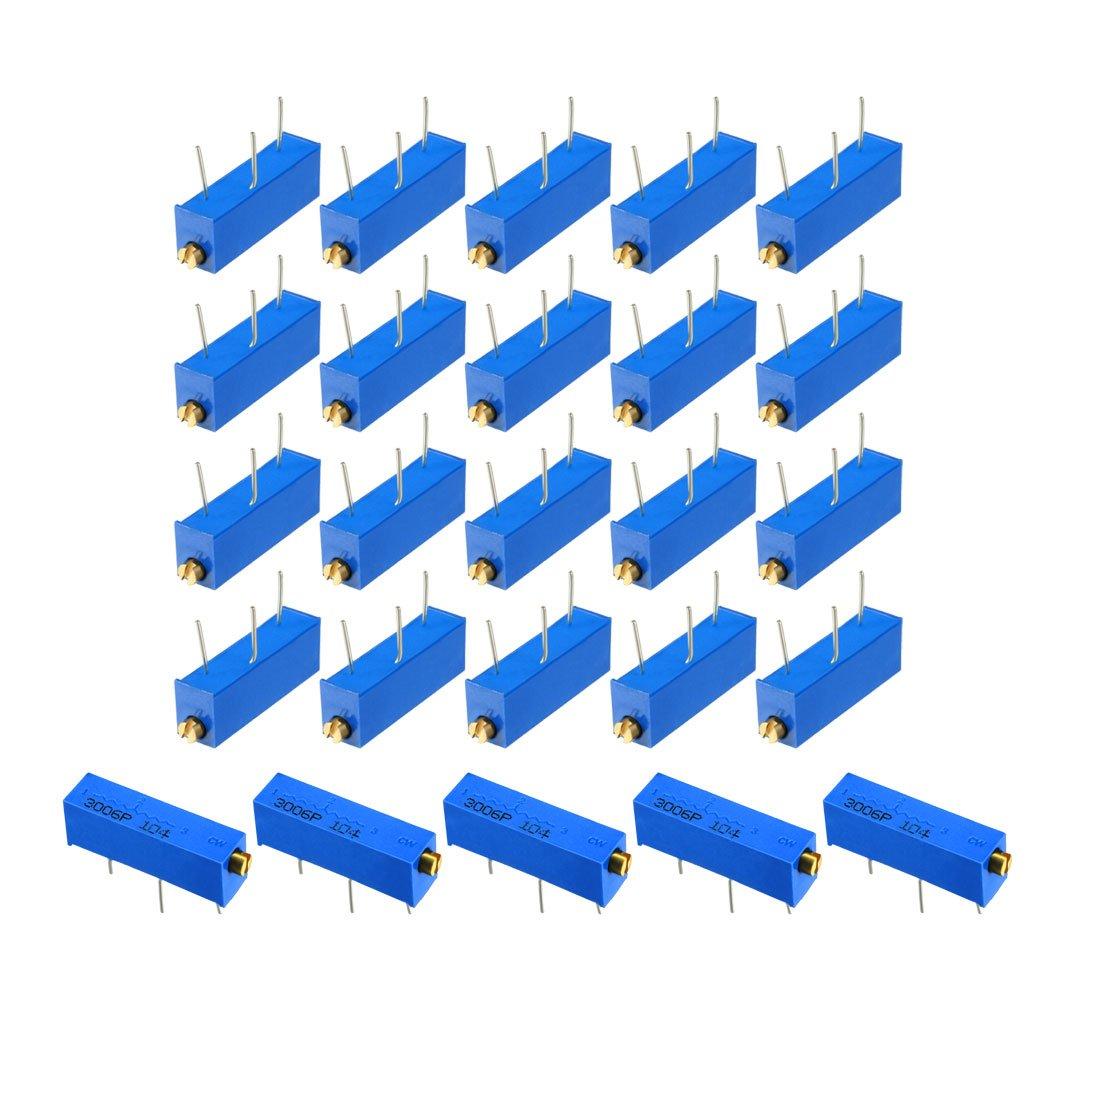 uxcell Variable Resistors 2k Ohm Side Adjustment Vertical Cermet Potentiometer 25 Pcs Blue